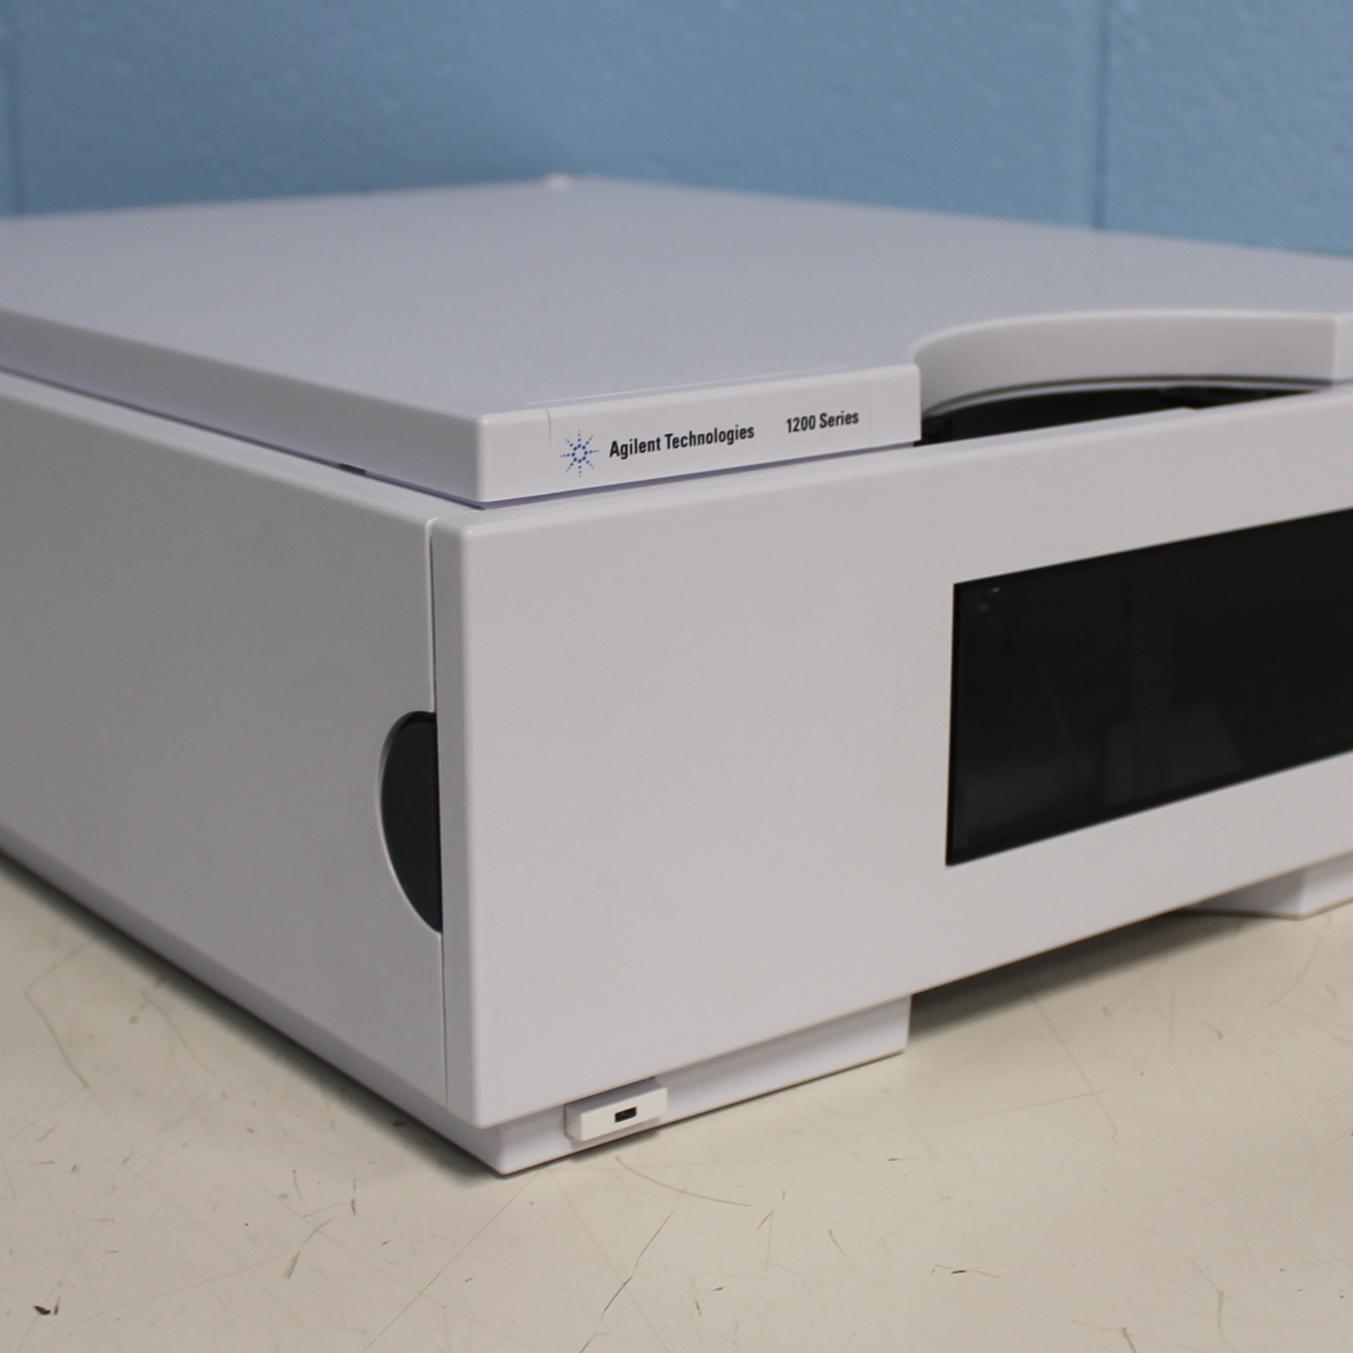 Agilent Technologies 1200 Series G1314B VWD Variable Wavelength Detector Image